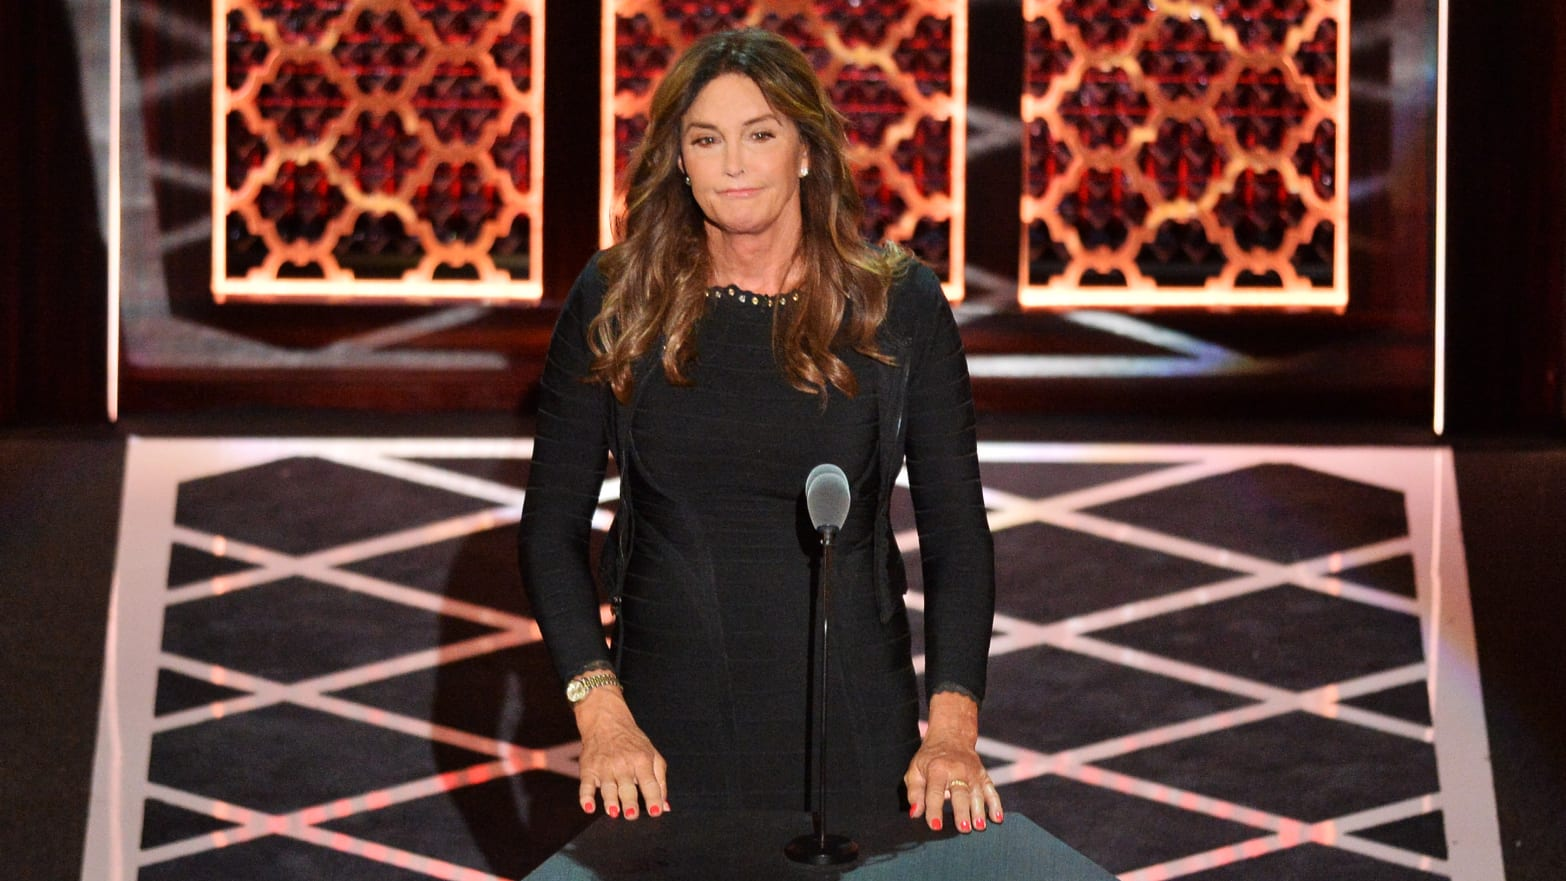 Caitlyn Jenner Gets Meanest Jokes at Alec Baldwin Roast—Then Her Revenge